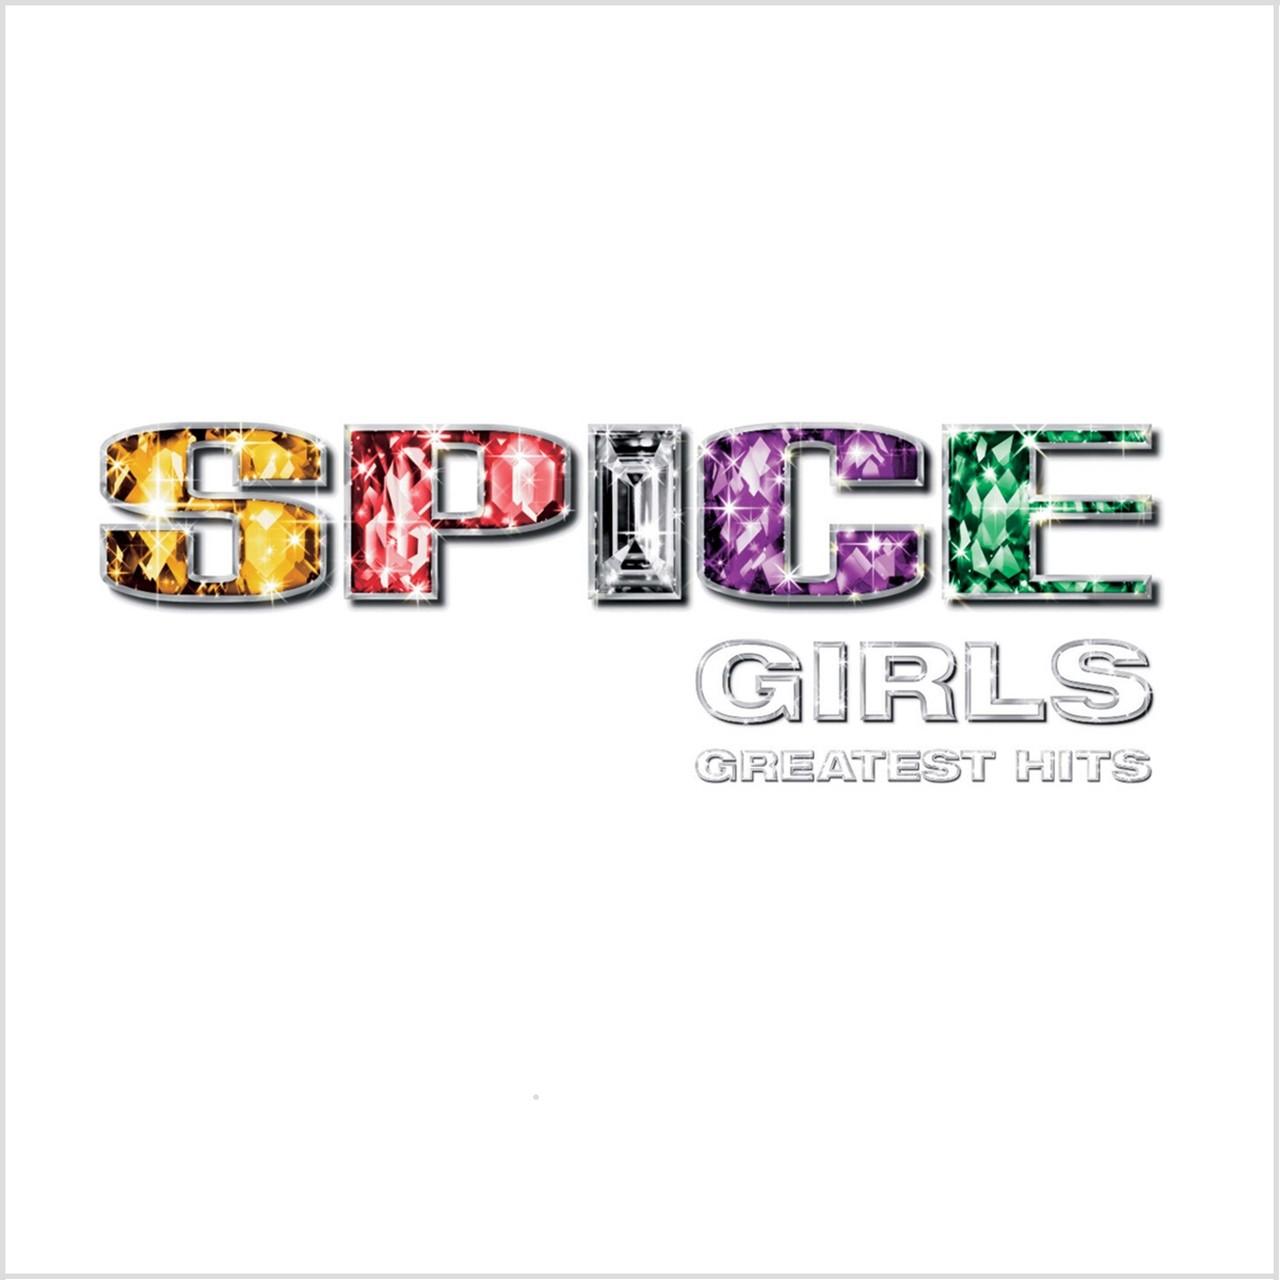 Spice Girls - Greatest Hits Vinyl LP